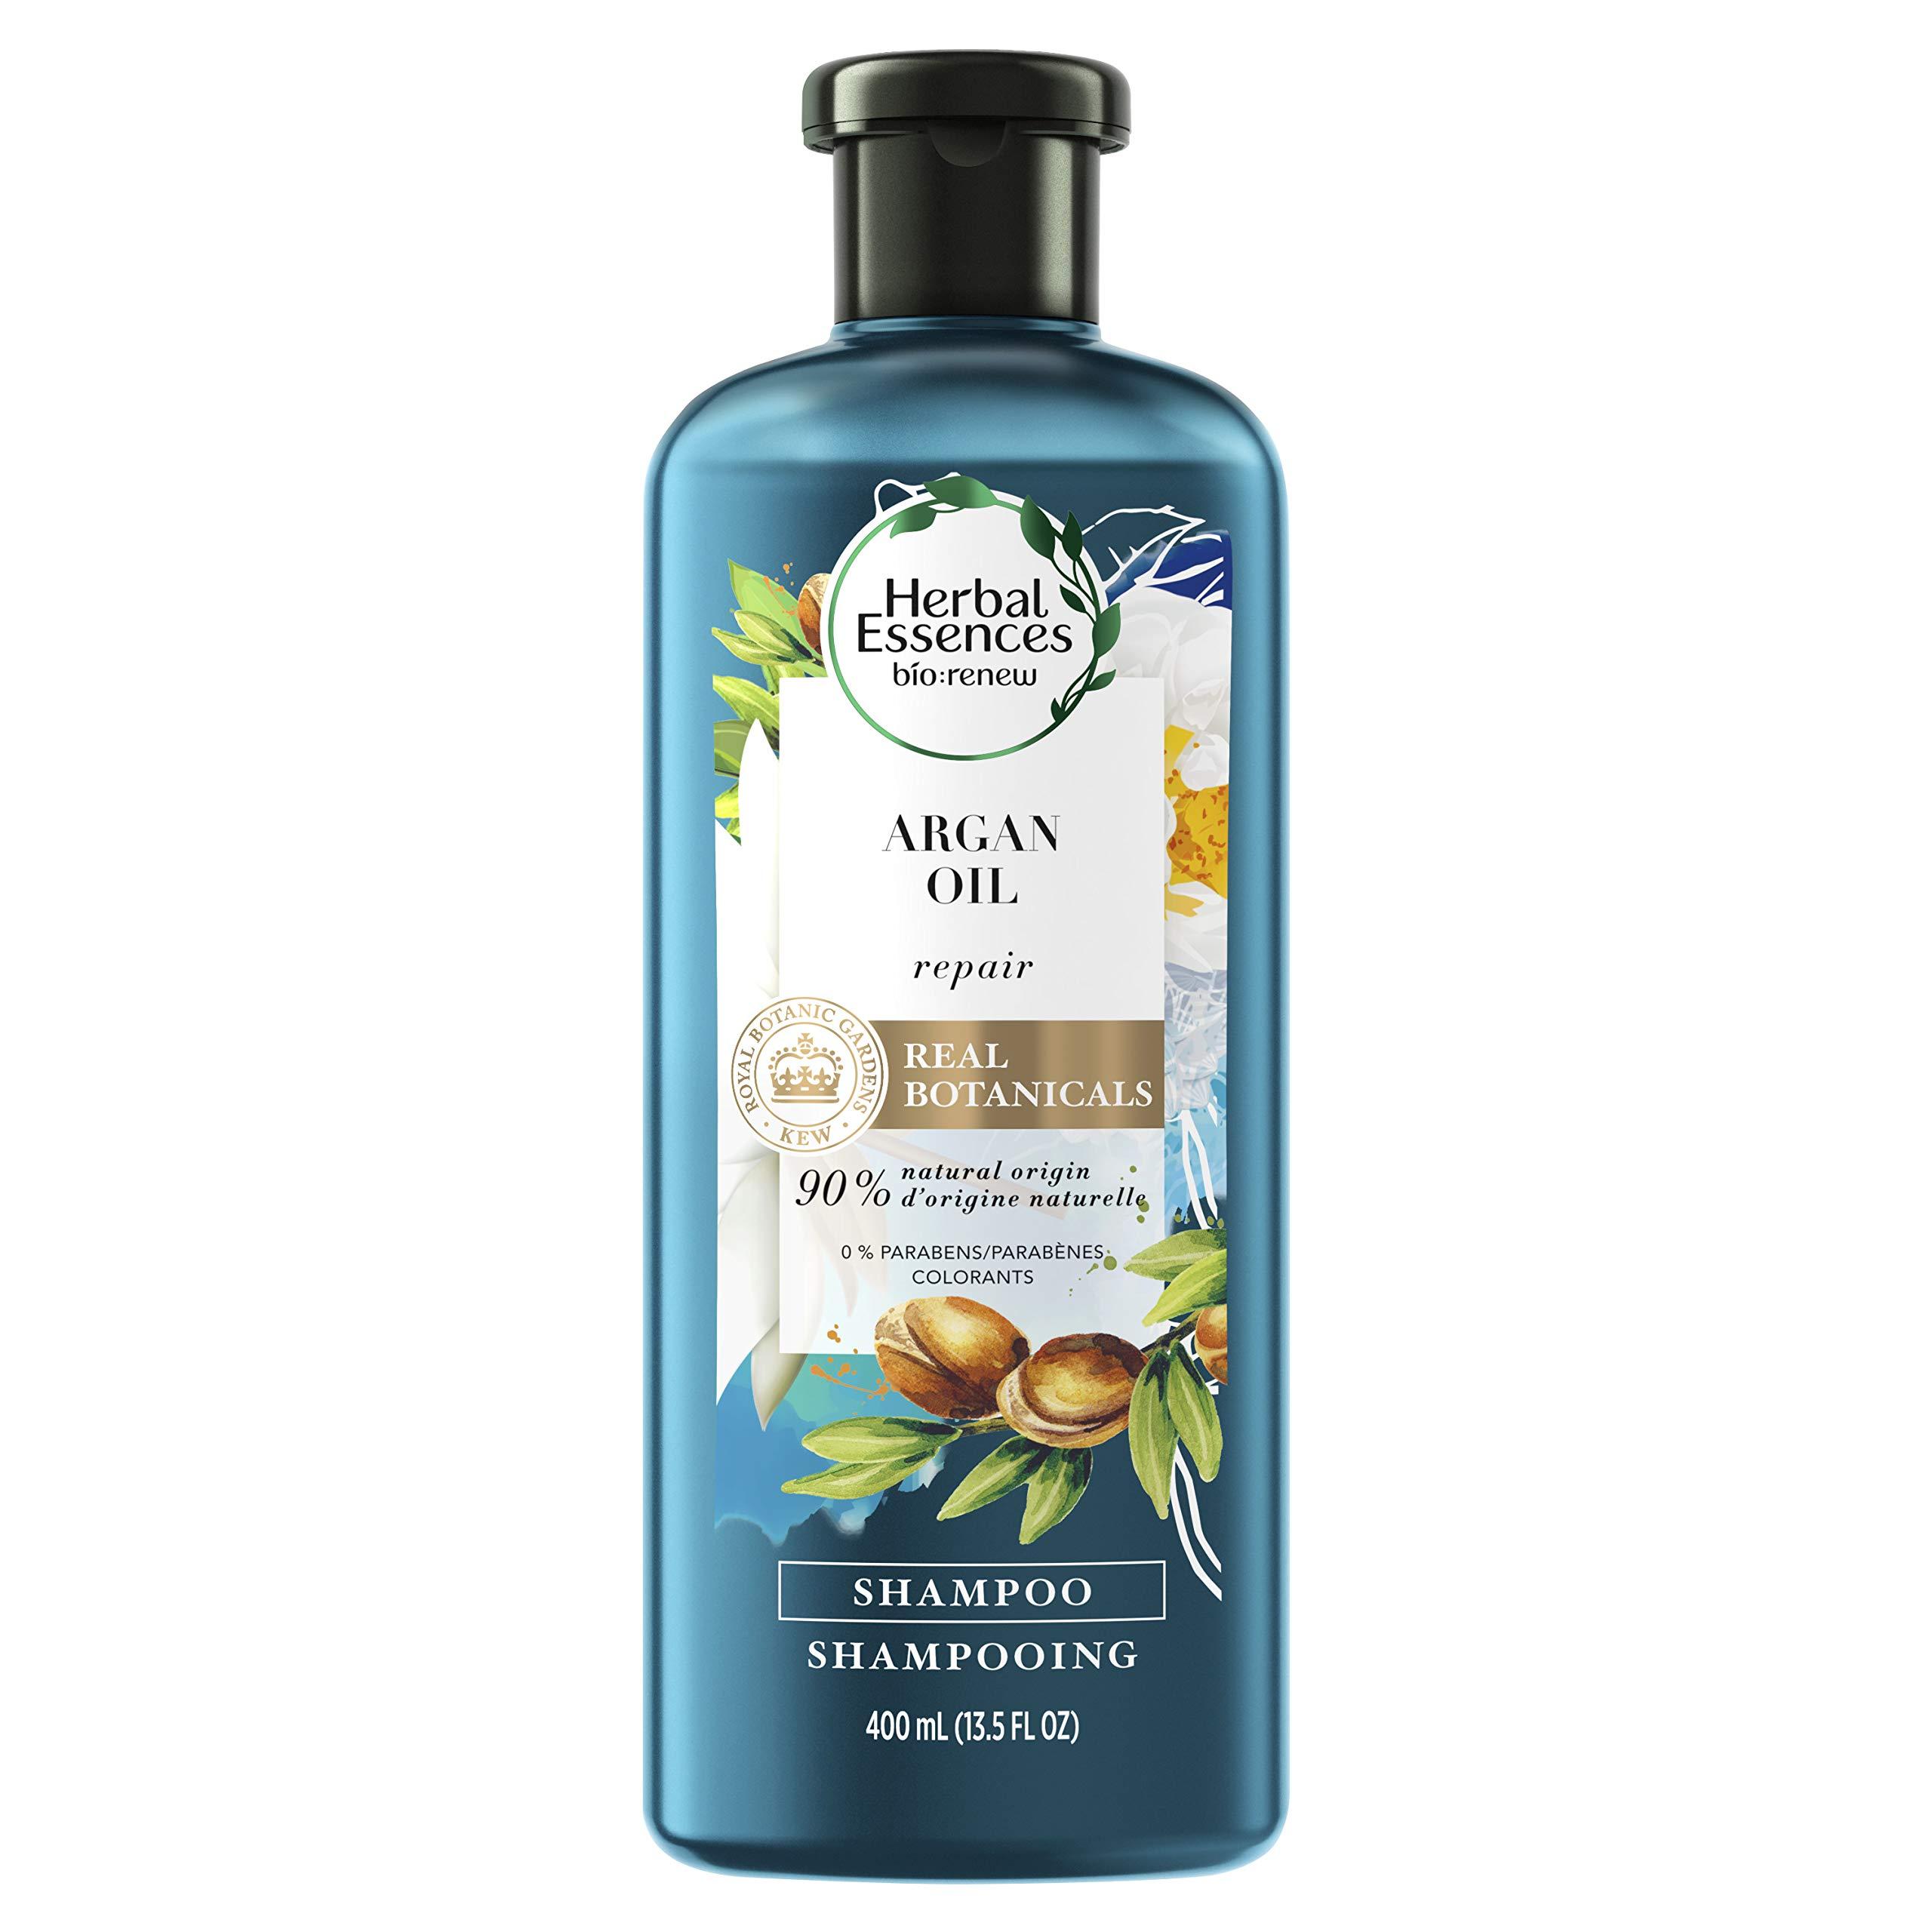 Herbal Essences Biorenew Argan Oil of Morocco Repair Shampoo, 13.5 FL OZ